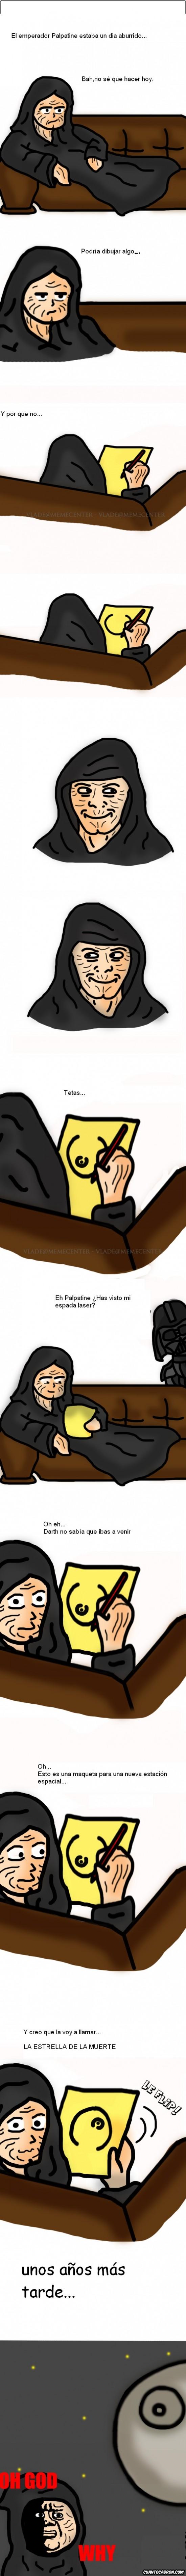 Darth Vader,estrella de la muerte,oh god why,Palpatine